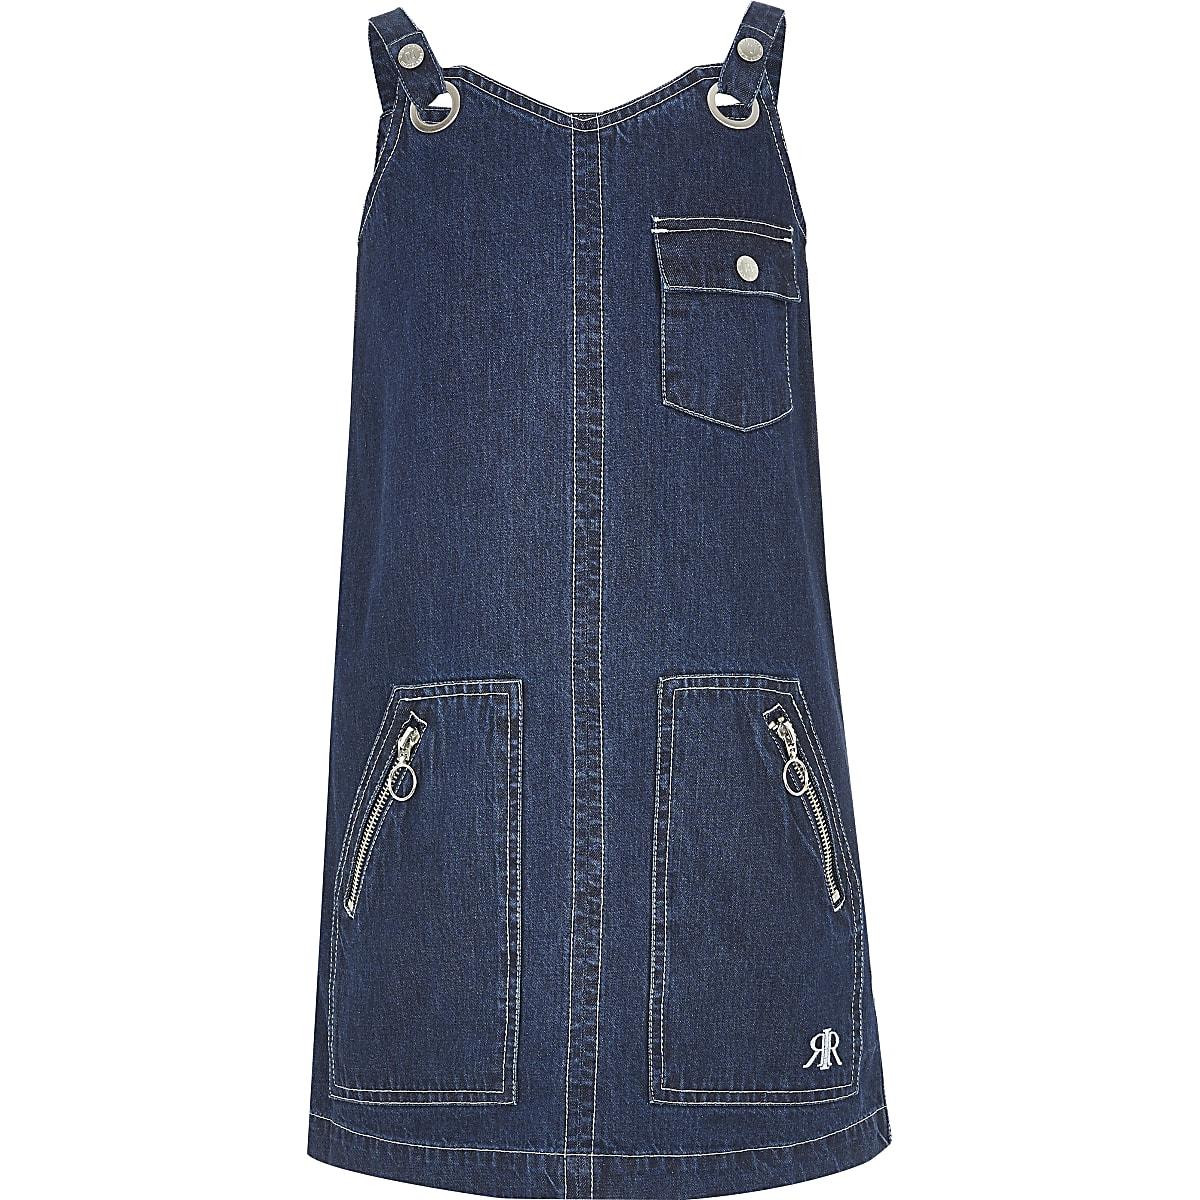 Donkerblauwe denim utility-jurk voor meisjes